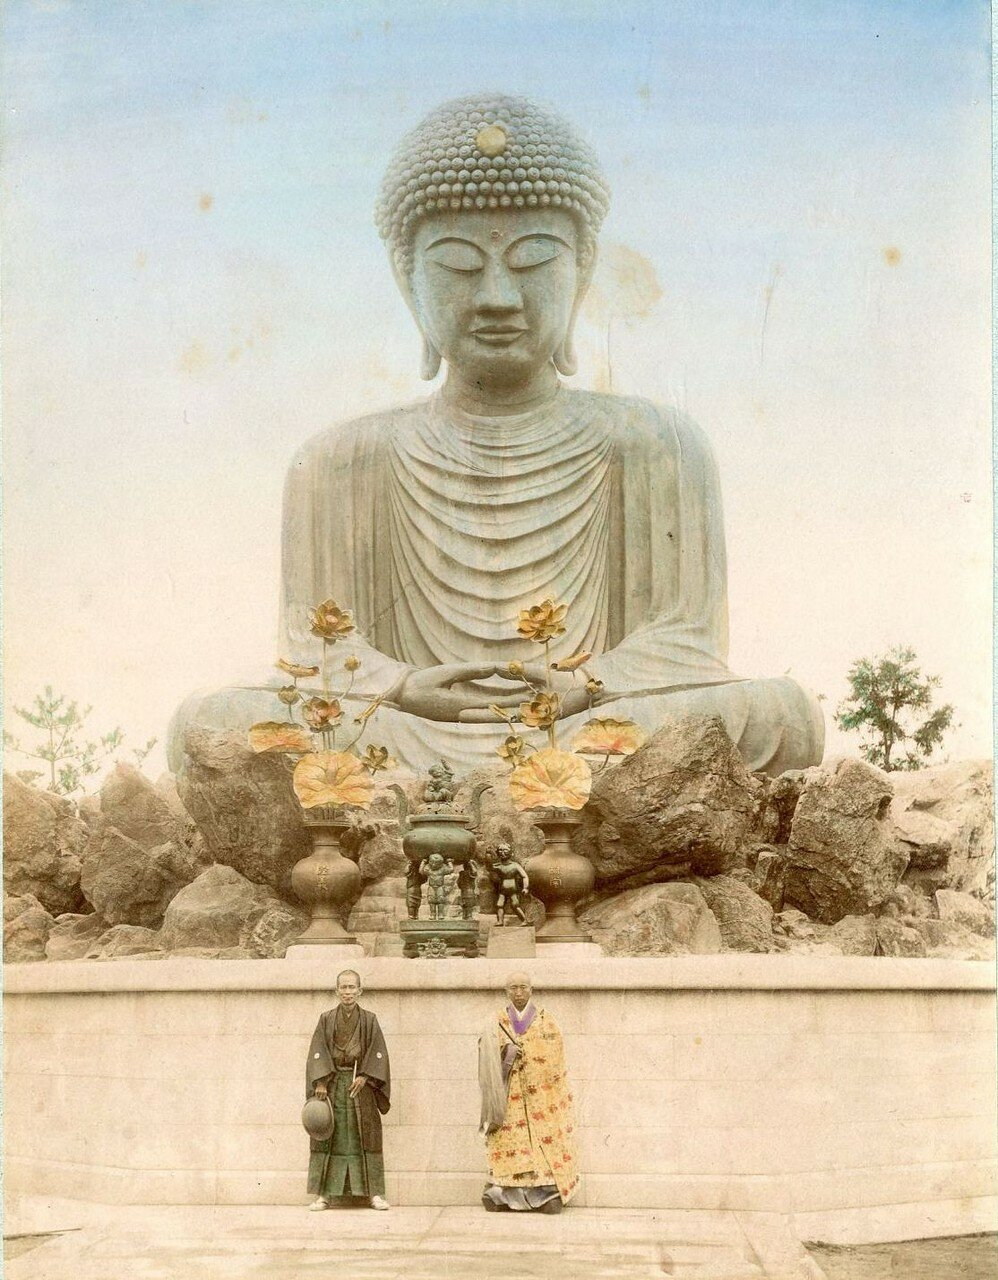 Киото. Храм Тофуку-дзи. Большой Будда